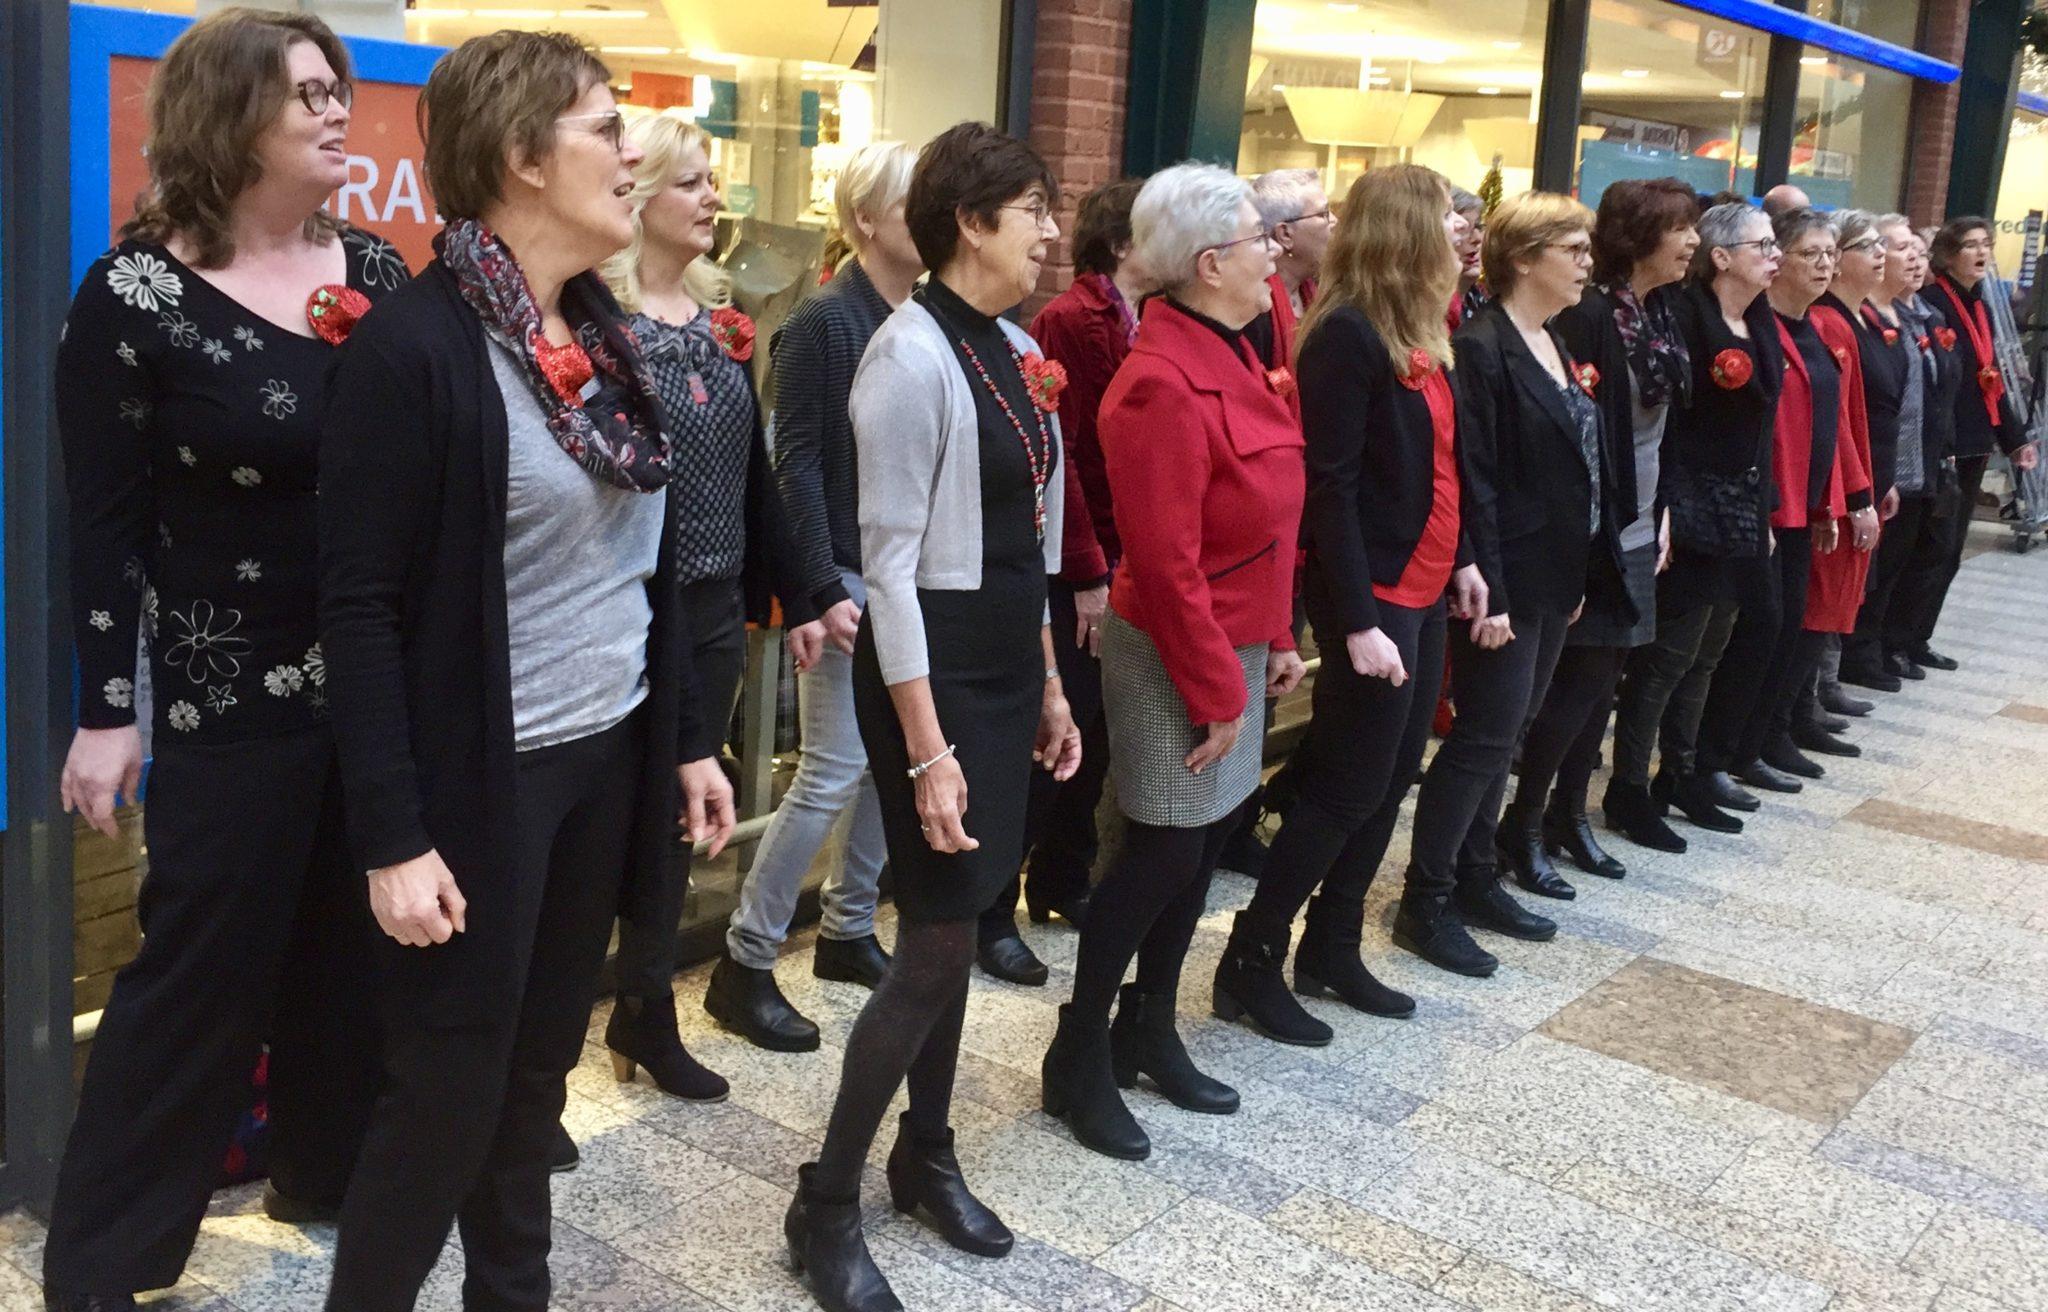 A-Capella (flashmob) in Ackershof Pijnacker